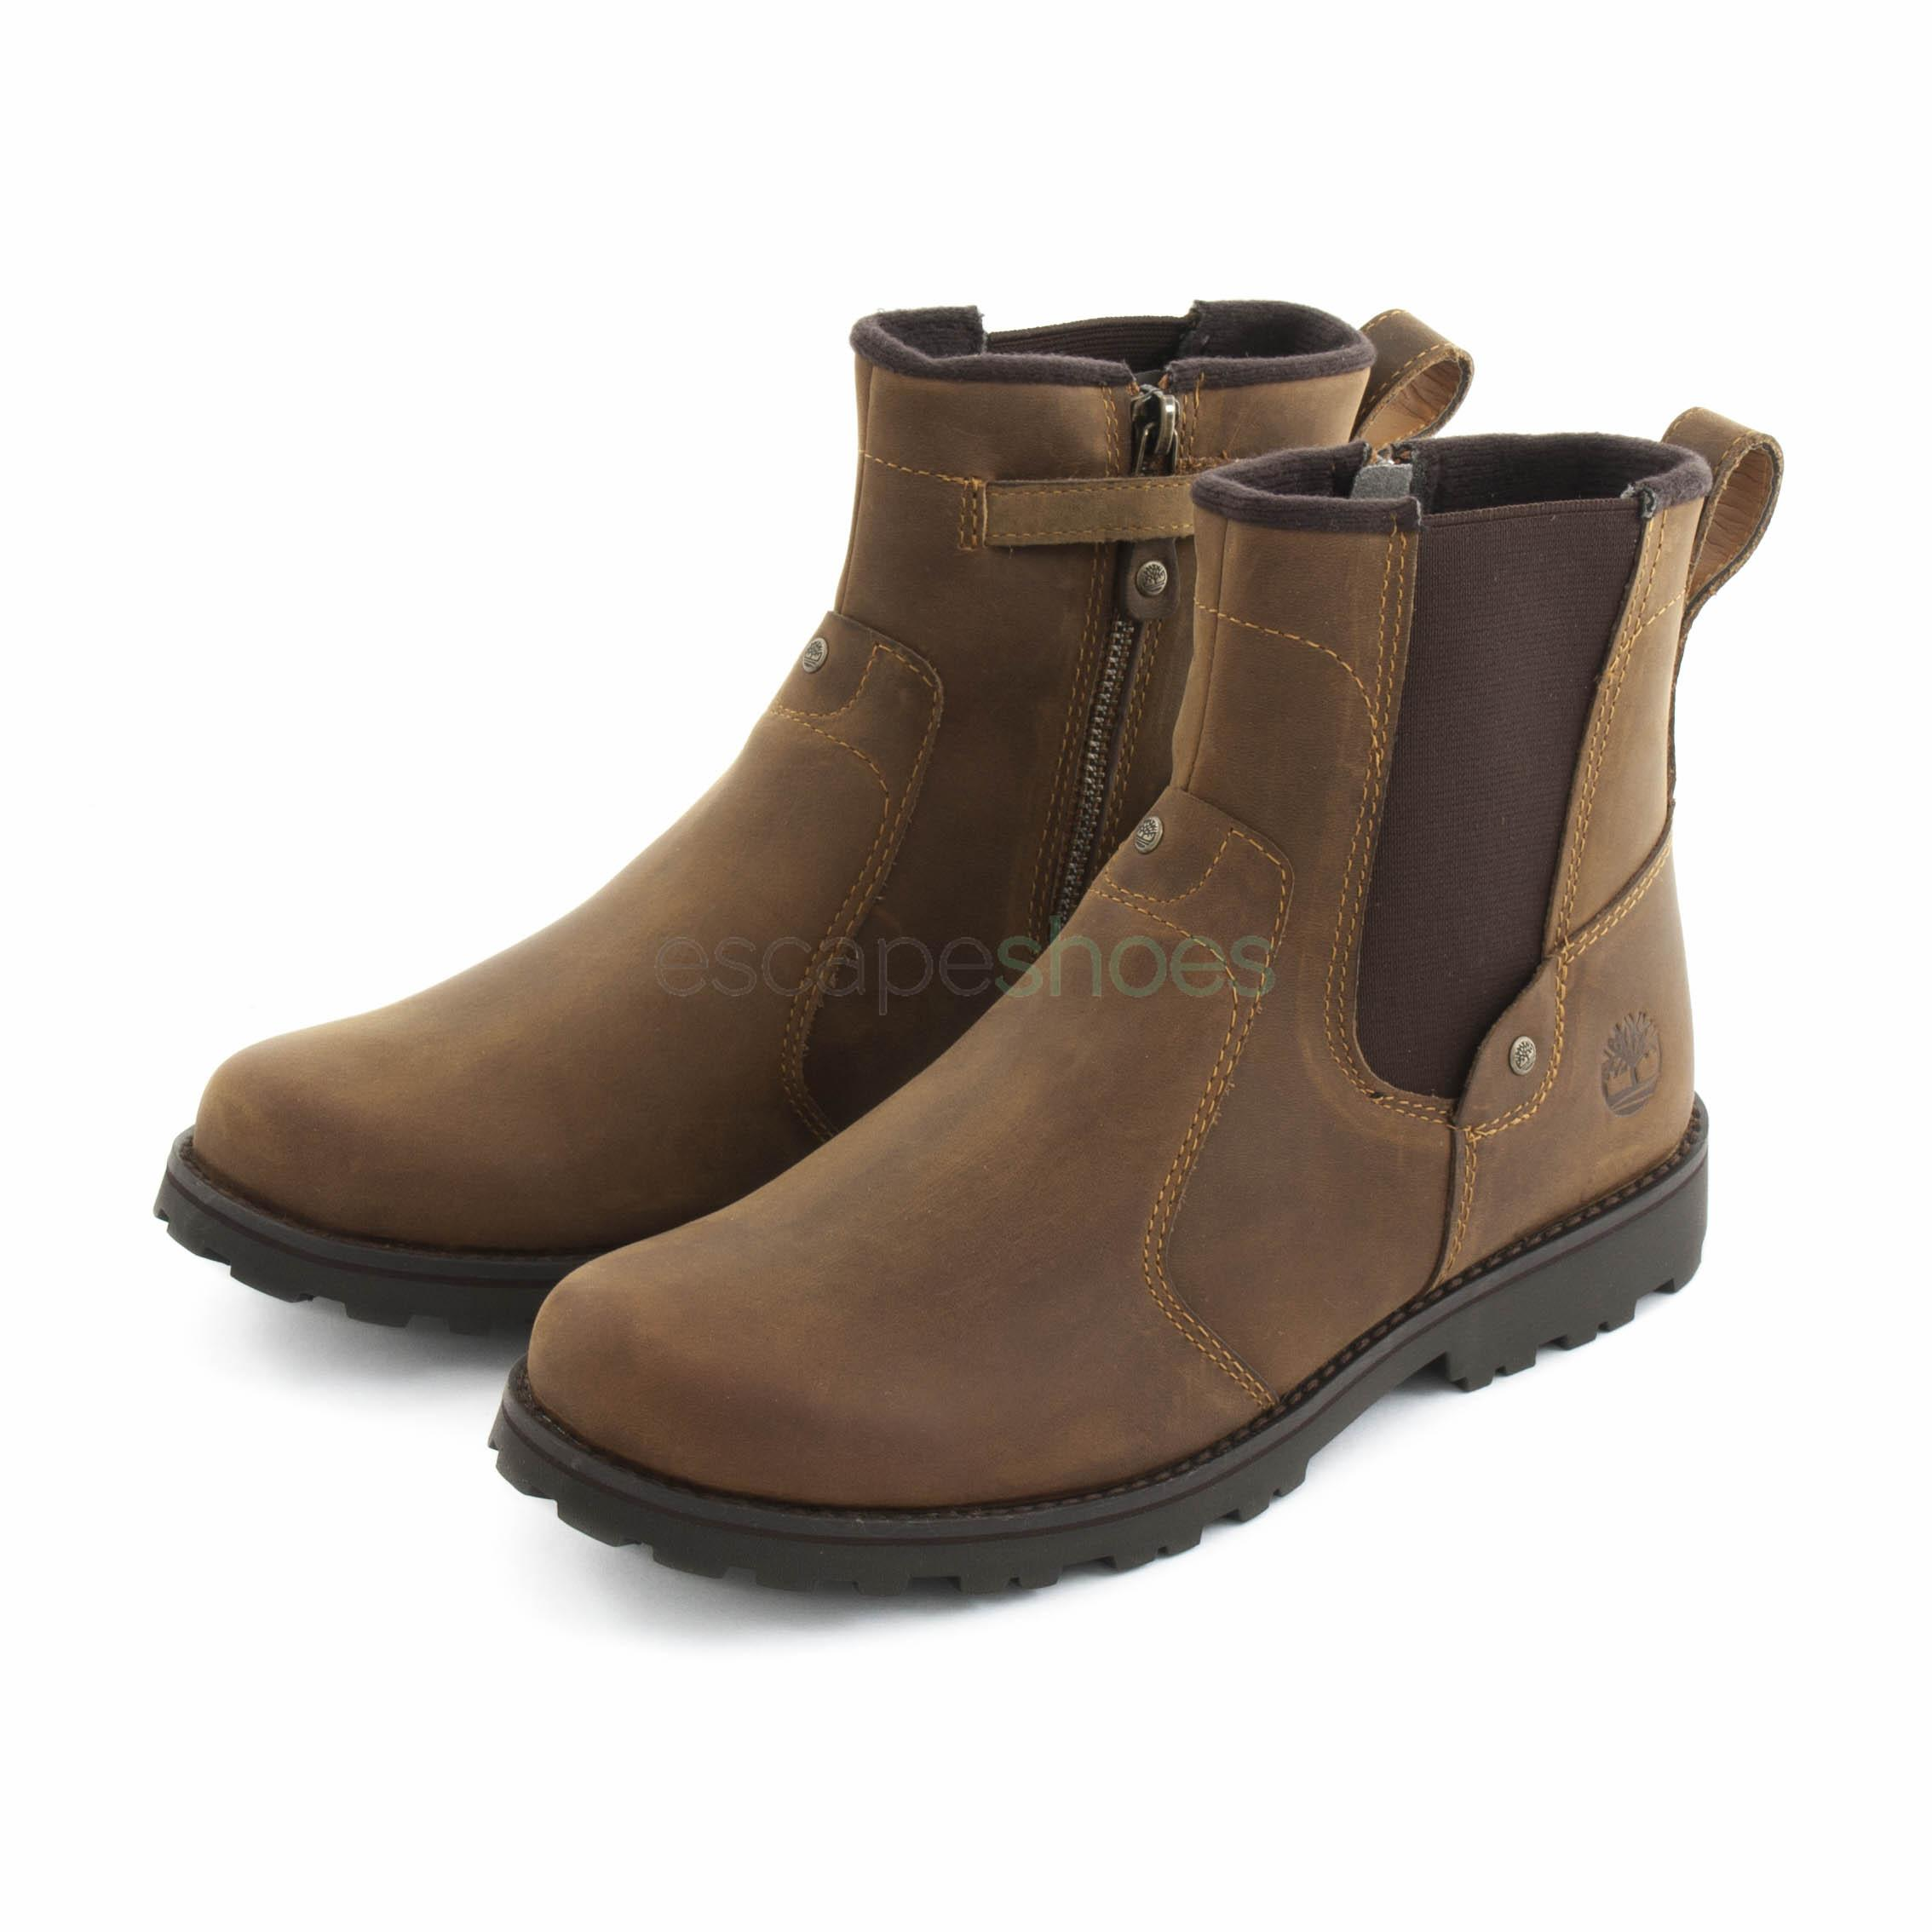 altavoz comprar notificación  Boots TIMBERLAND Junior Asphalt Trail Chelsea Brown 1391R